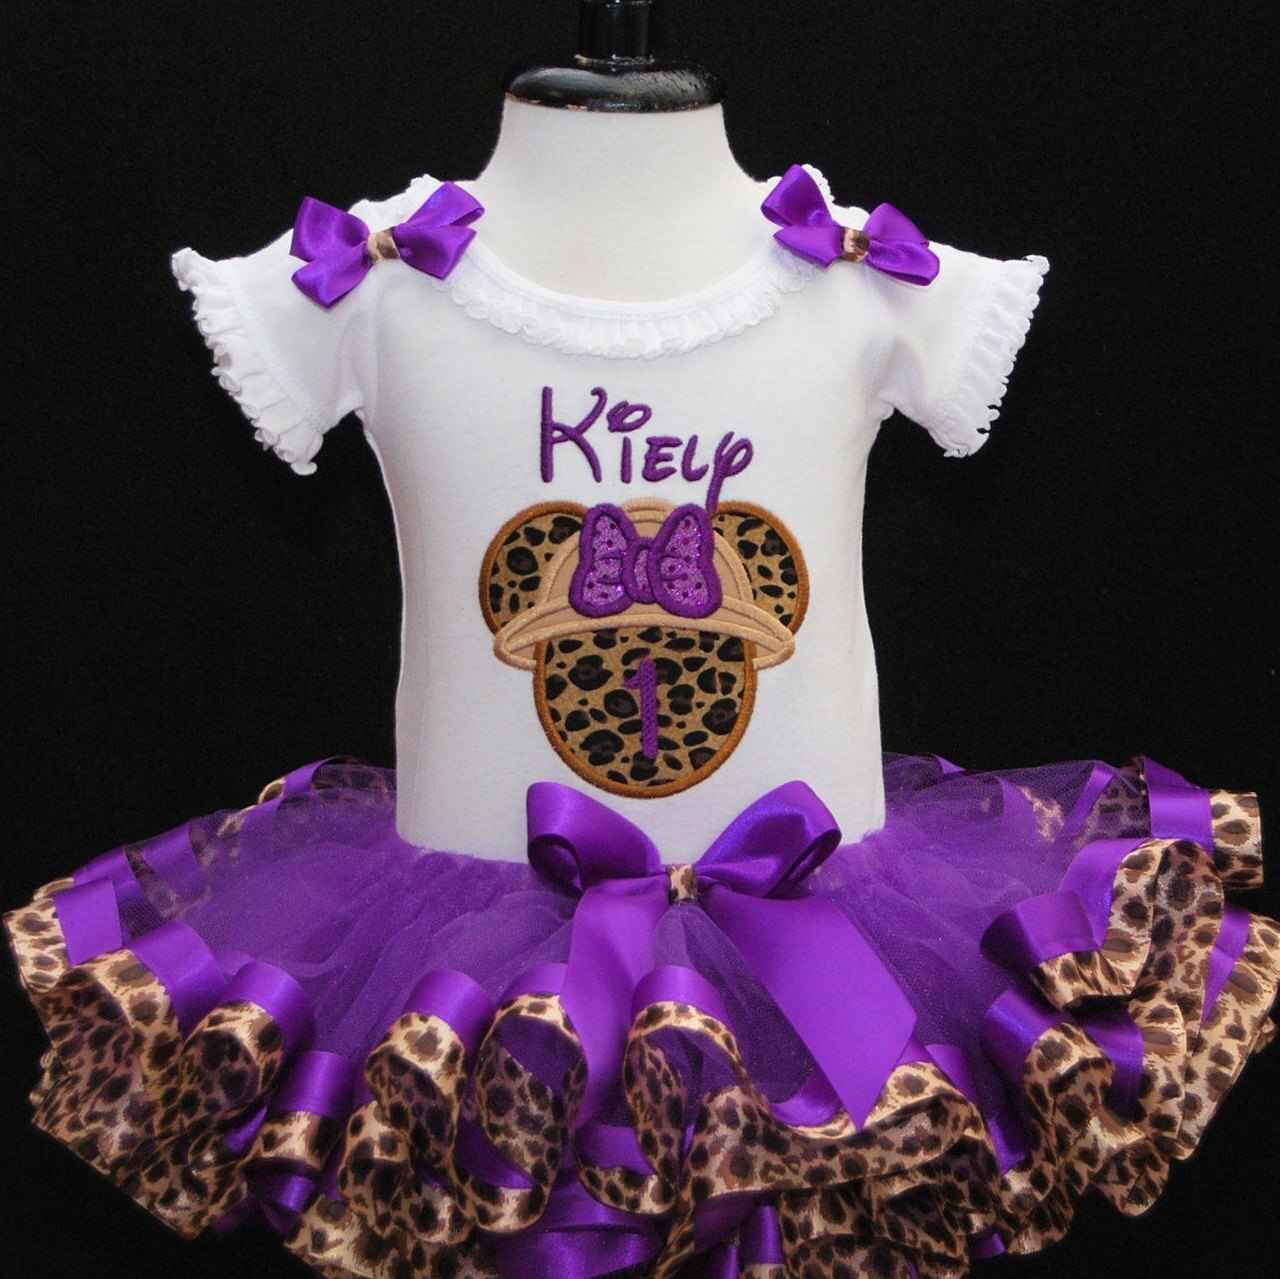 Safari Birthday Tutu Outfit with Leopard Ribbon Trimmed Tutu, 1st Birthday Tutu Outfit Minnie Mouse Birthday tutu outfit, purple safari